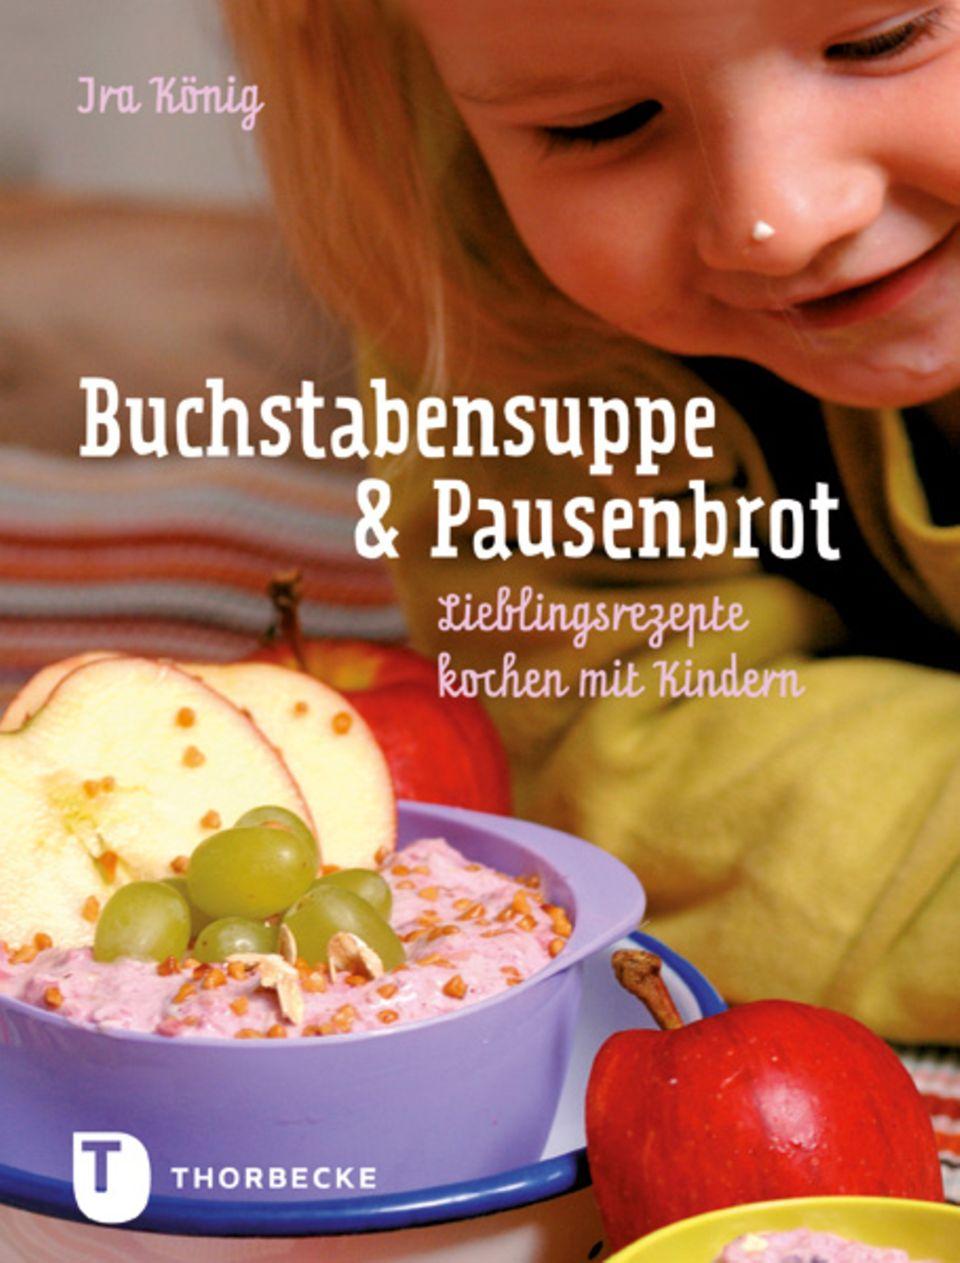 "Ira König: ""Buchstabensuppe & Pausenbrot - Lieblingsrezepte kochen mit Kindern"""